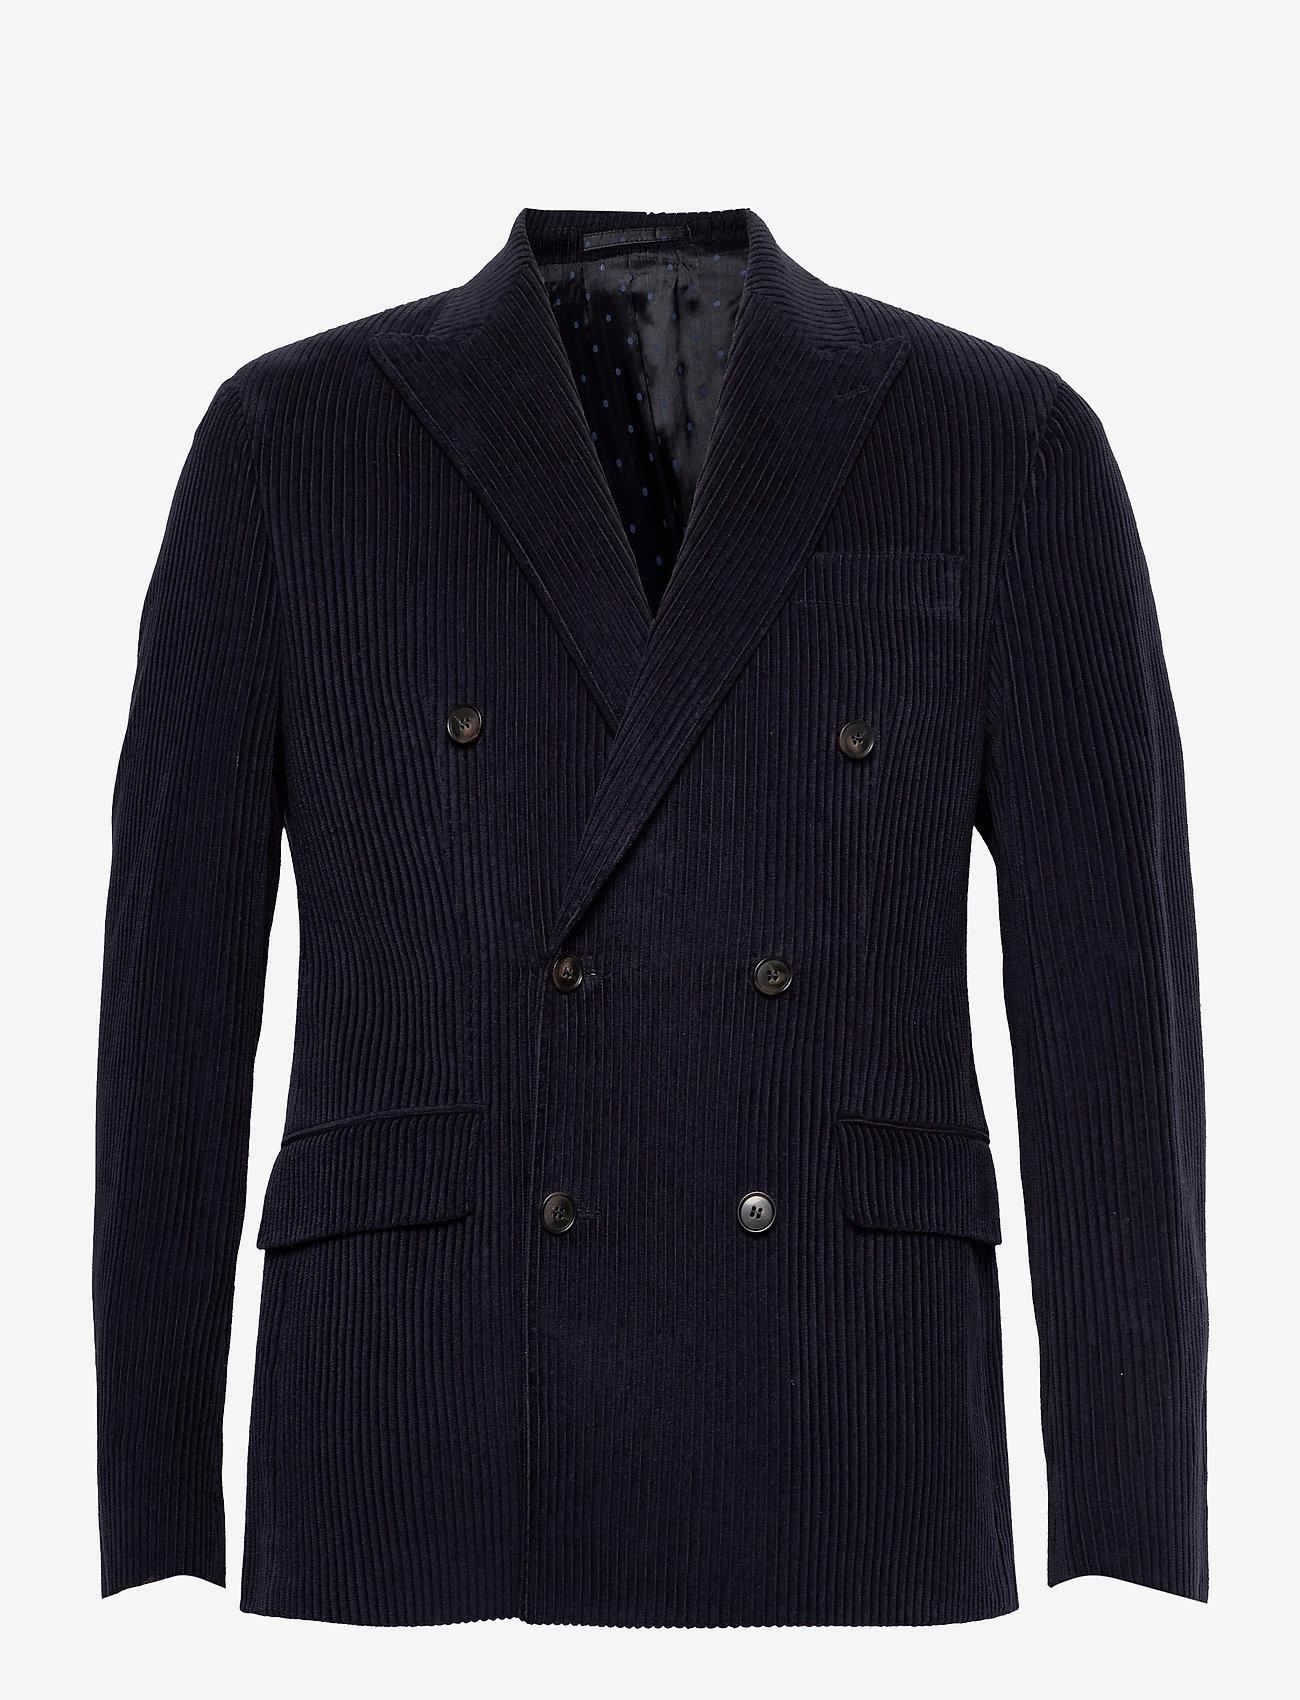 SAND - 1663 - Star DB Normal - single breasted blazers - dark blue/navy - 0